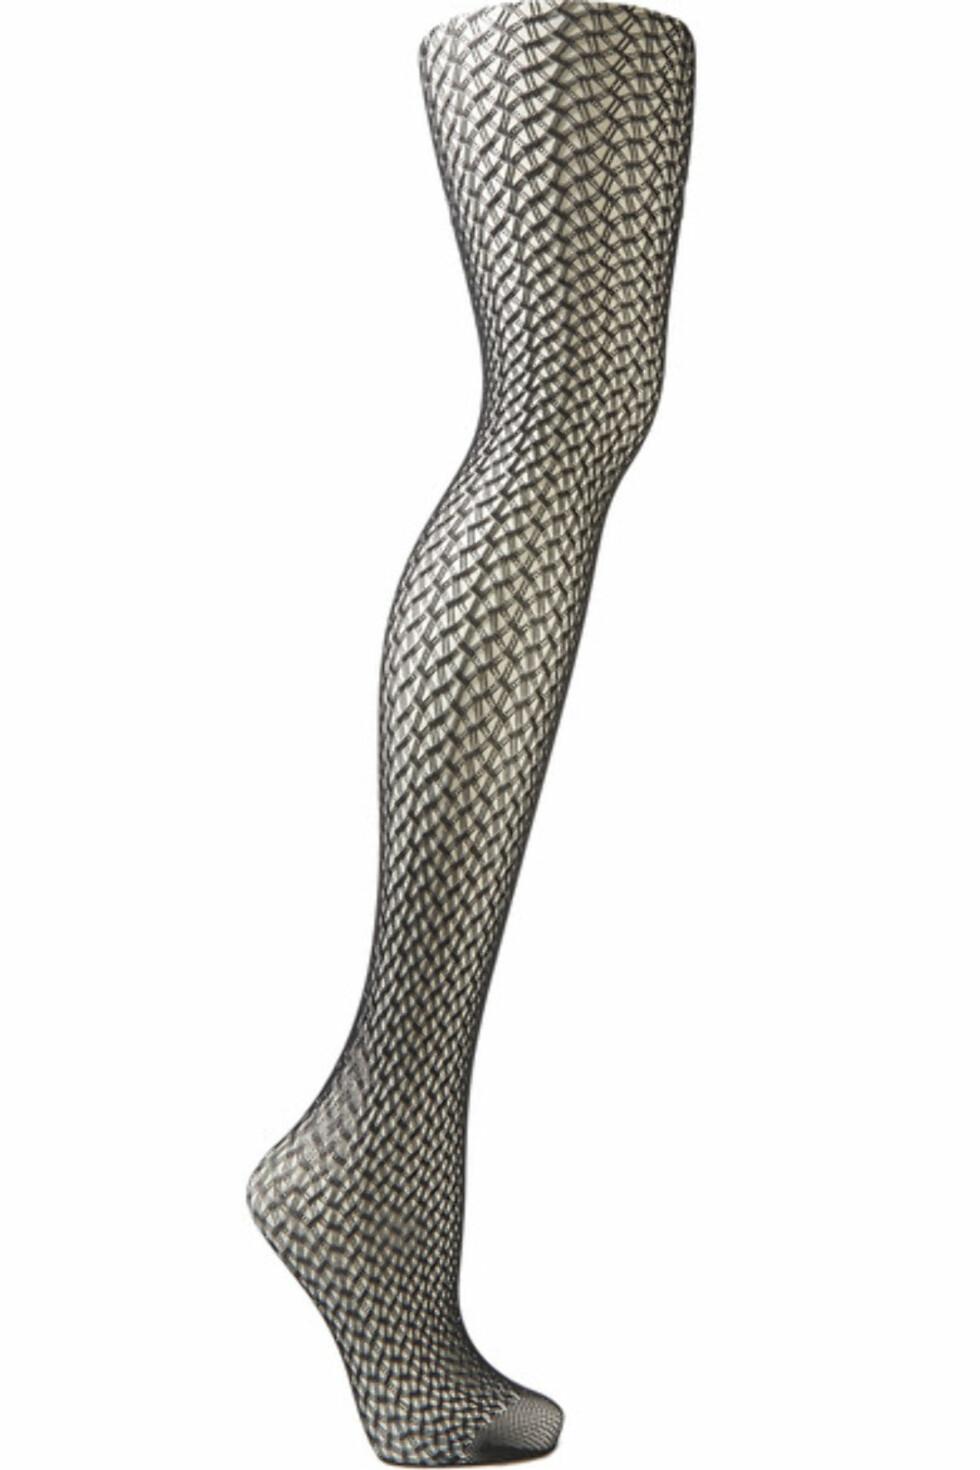 Strømpebukse fra Wolford via Net-a-porter.com | kr 500 | https://www.net-a-porter.com/no/en/product/743916/wolford/nele-geometric-net-tights